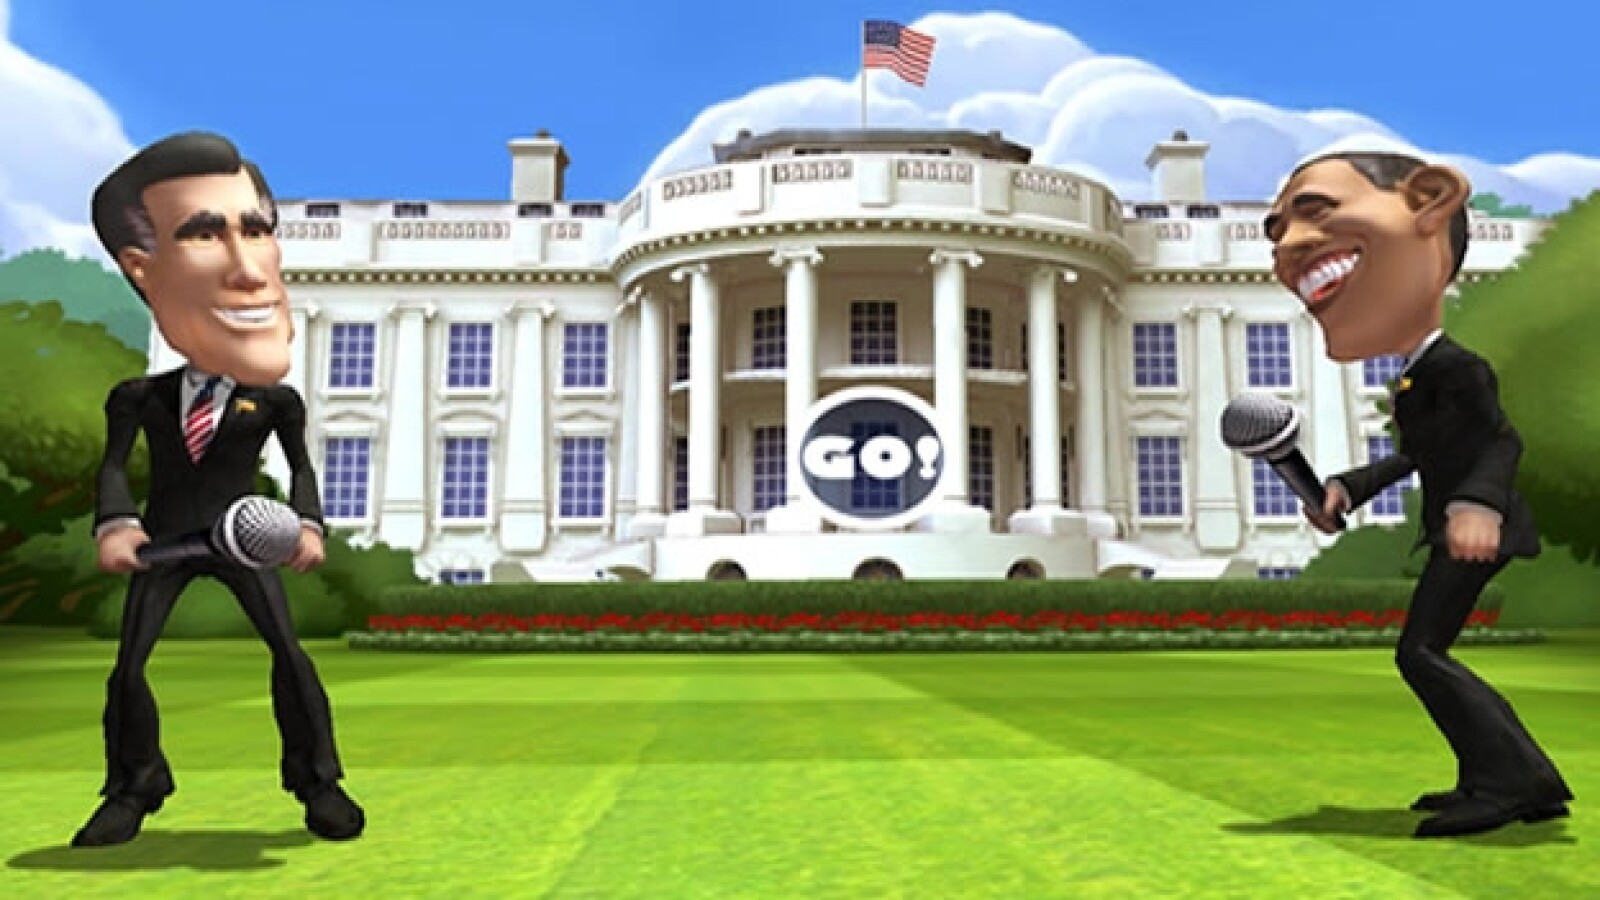 barack obama mitt romney casa blanca video juego epic games